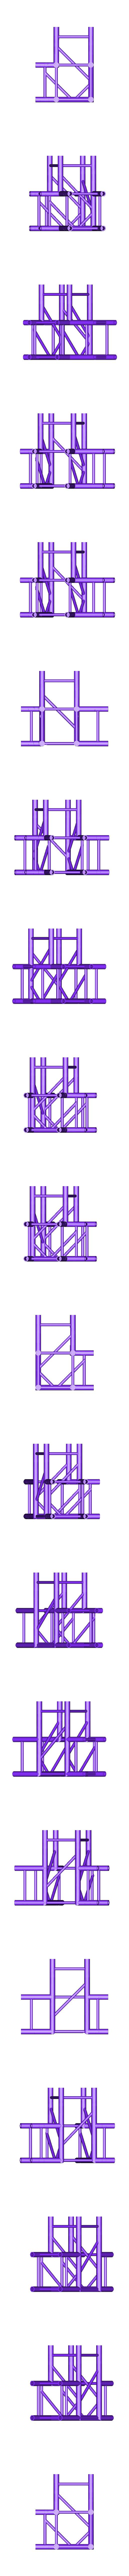 Truss 4 Punkt Traverse GWX031 4-Weg Ecke 90° Sondermaß S (x1).stl Download STL file 1:18 Truss 4 Punkt Traverse Messestand ZSB1000 • Template to 3D print, CrossModellbau